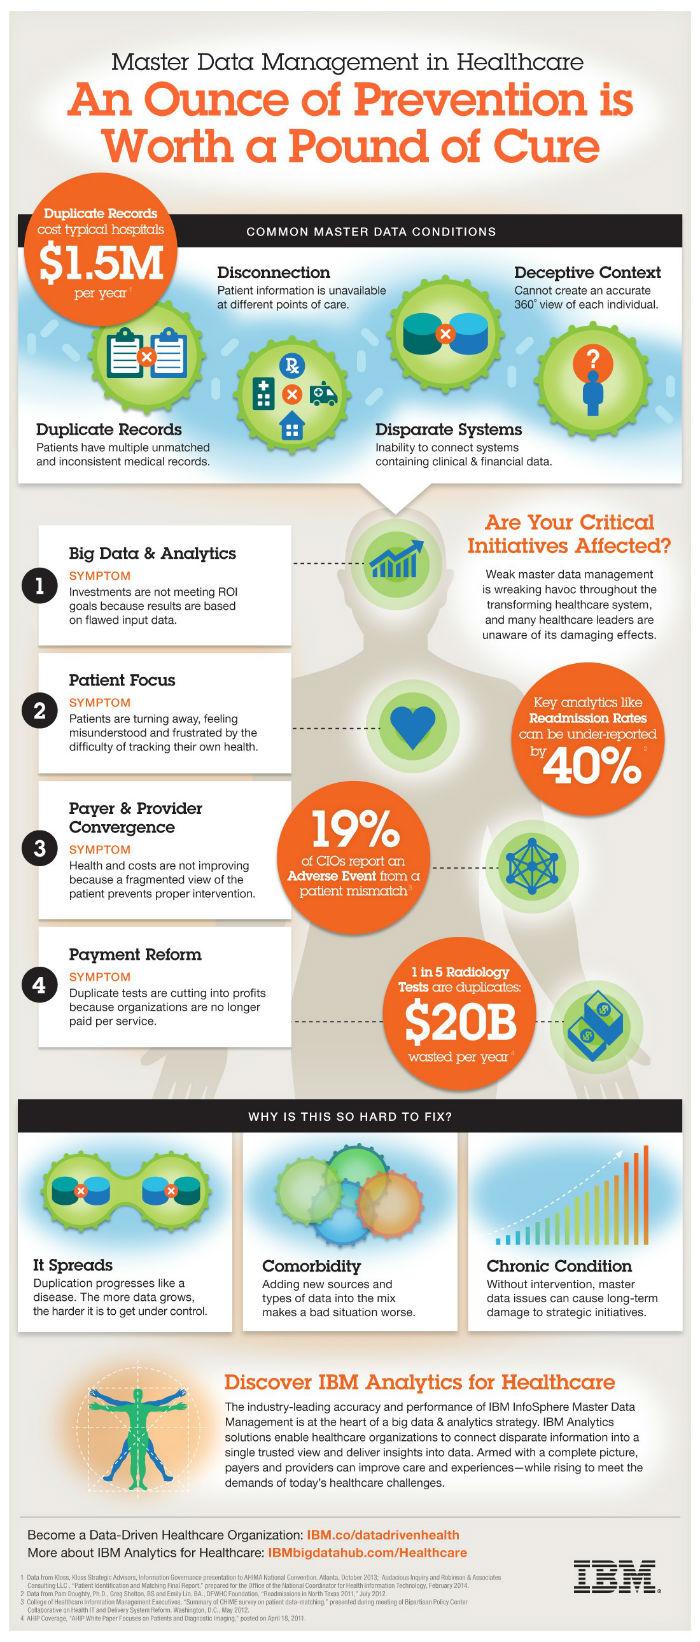 mdm-healthcare-infographic-4-13-15